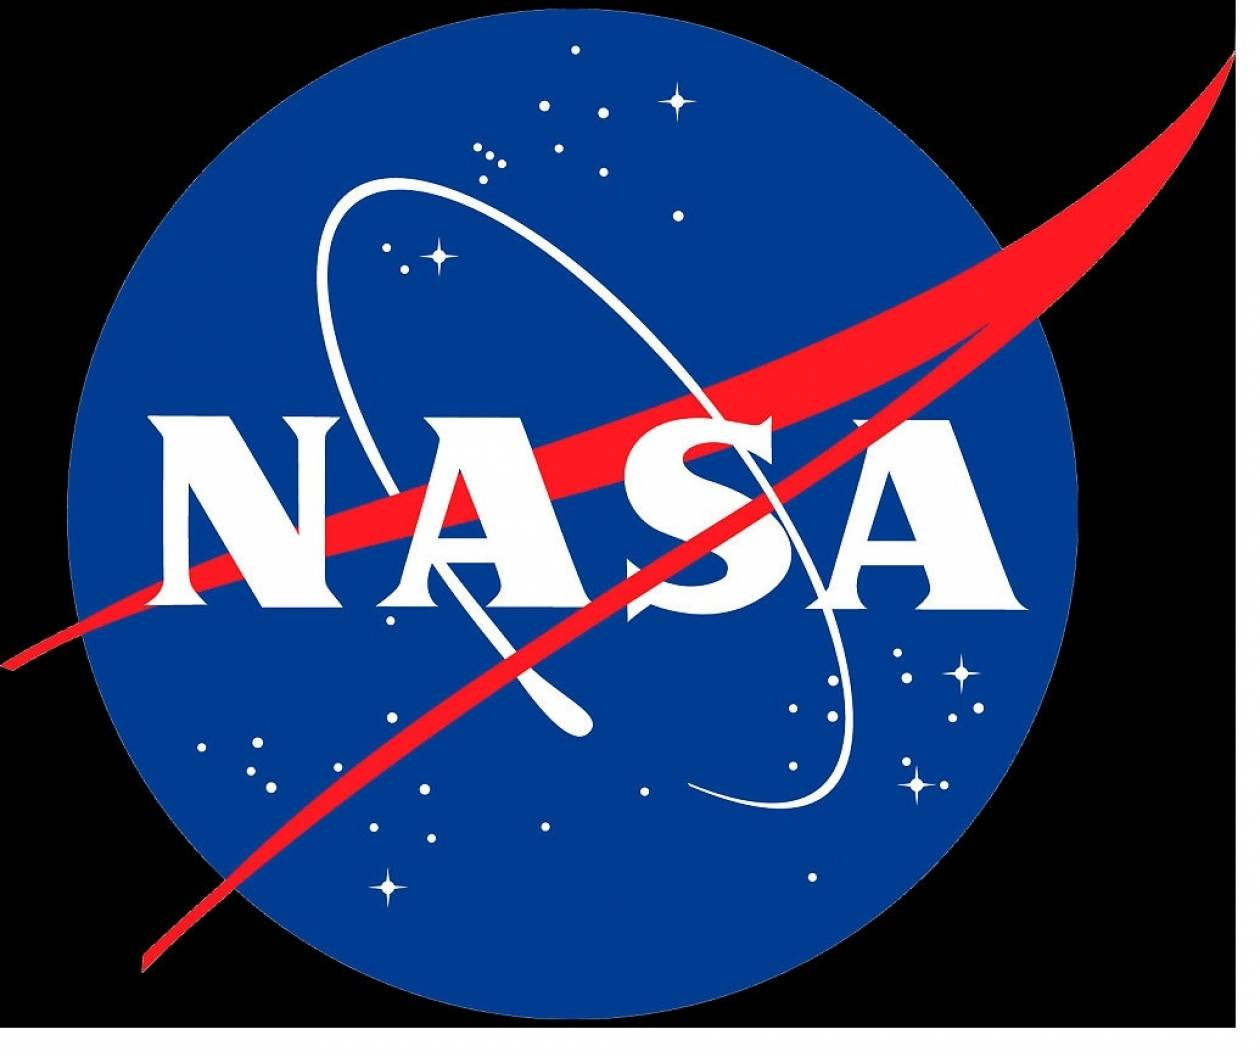 H NASA καταπολεμά την αϋπνία στο... διάστημα